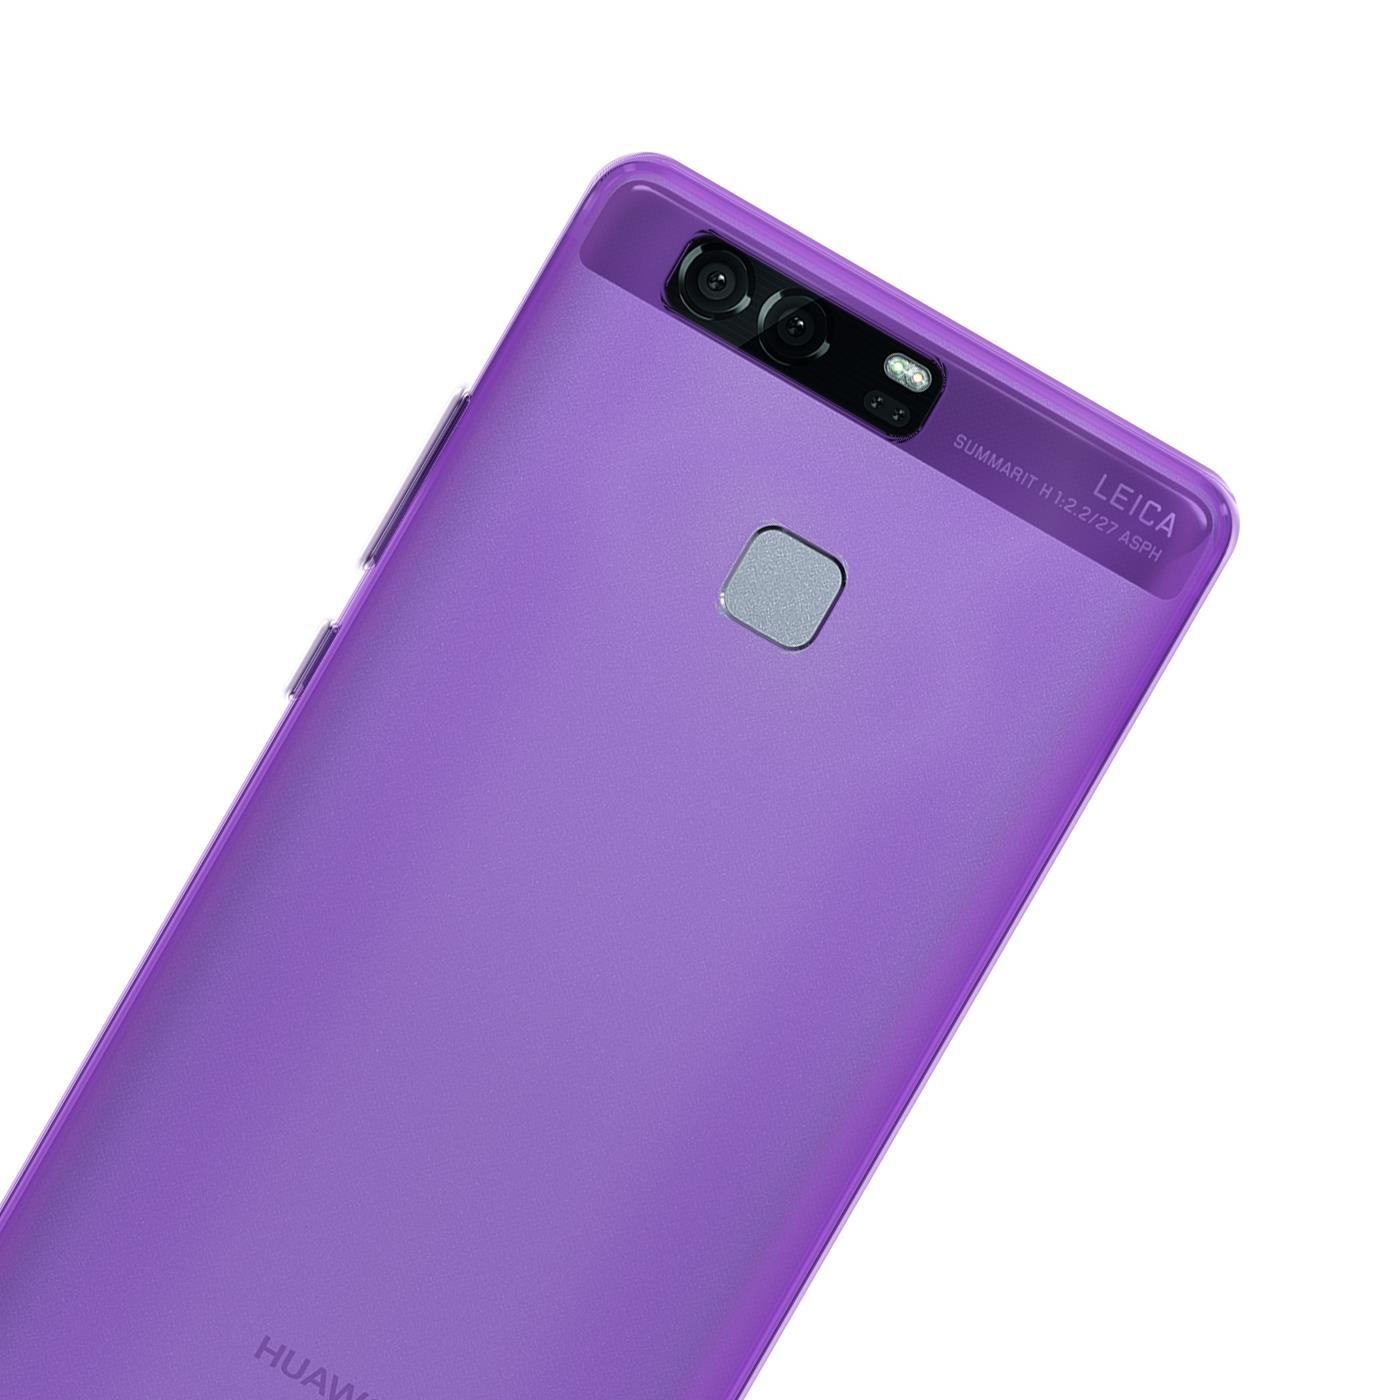 Huawei-p9-Duenn-Silikon-Klar-Case-Cover-Ultra-Slim-Stossfeste-Gel-Rueckseite Indexbild 22